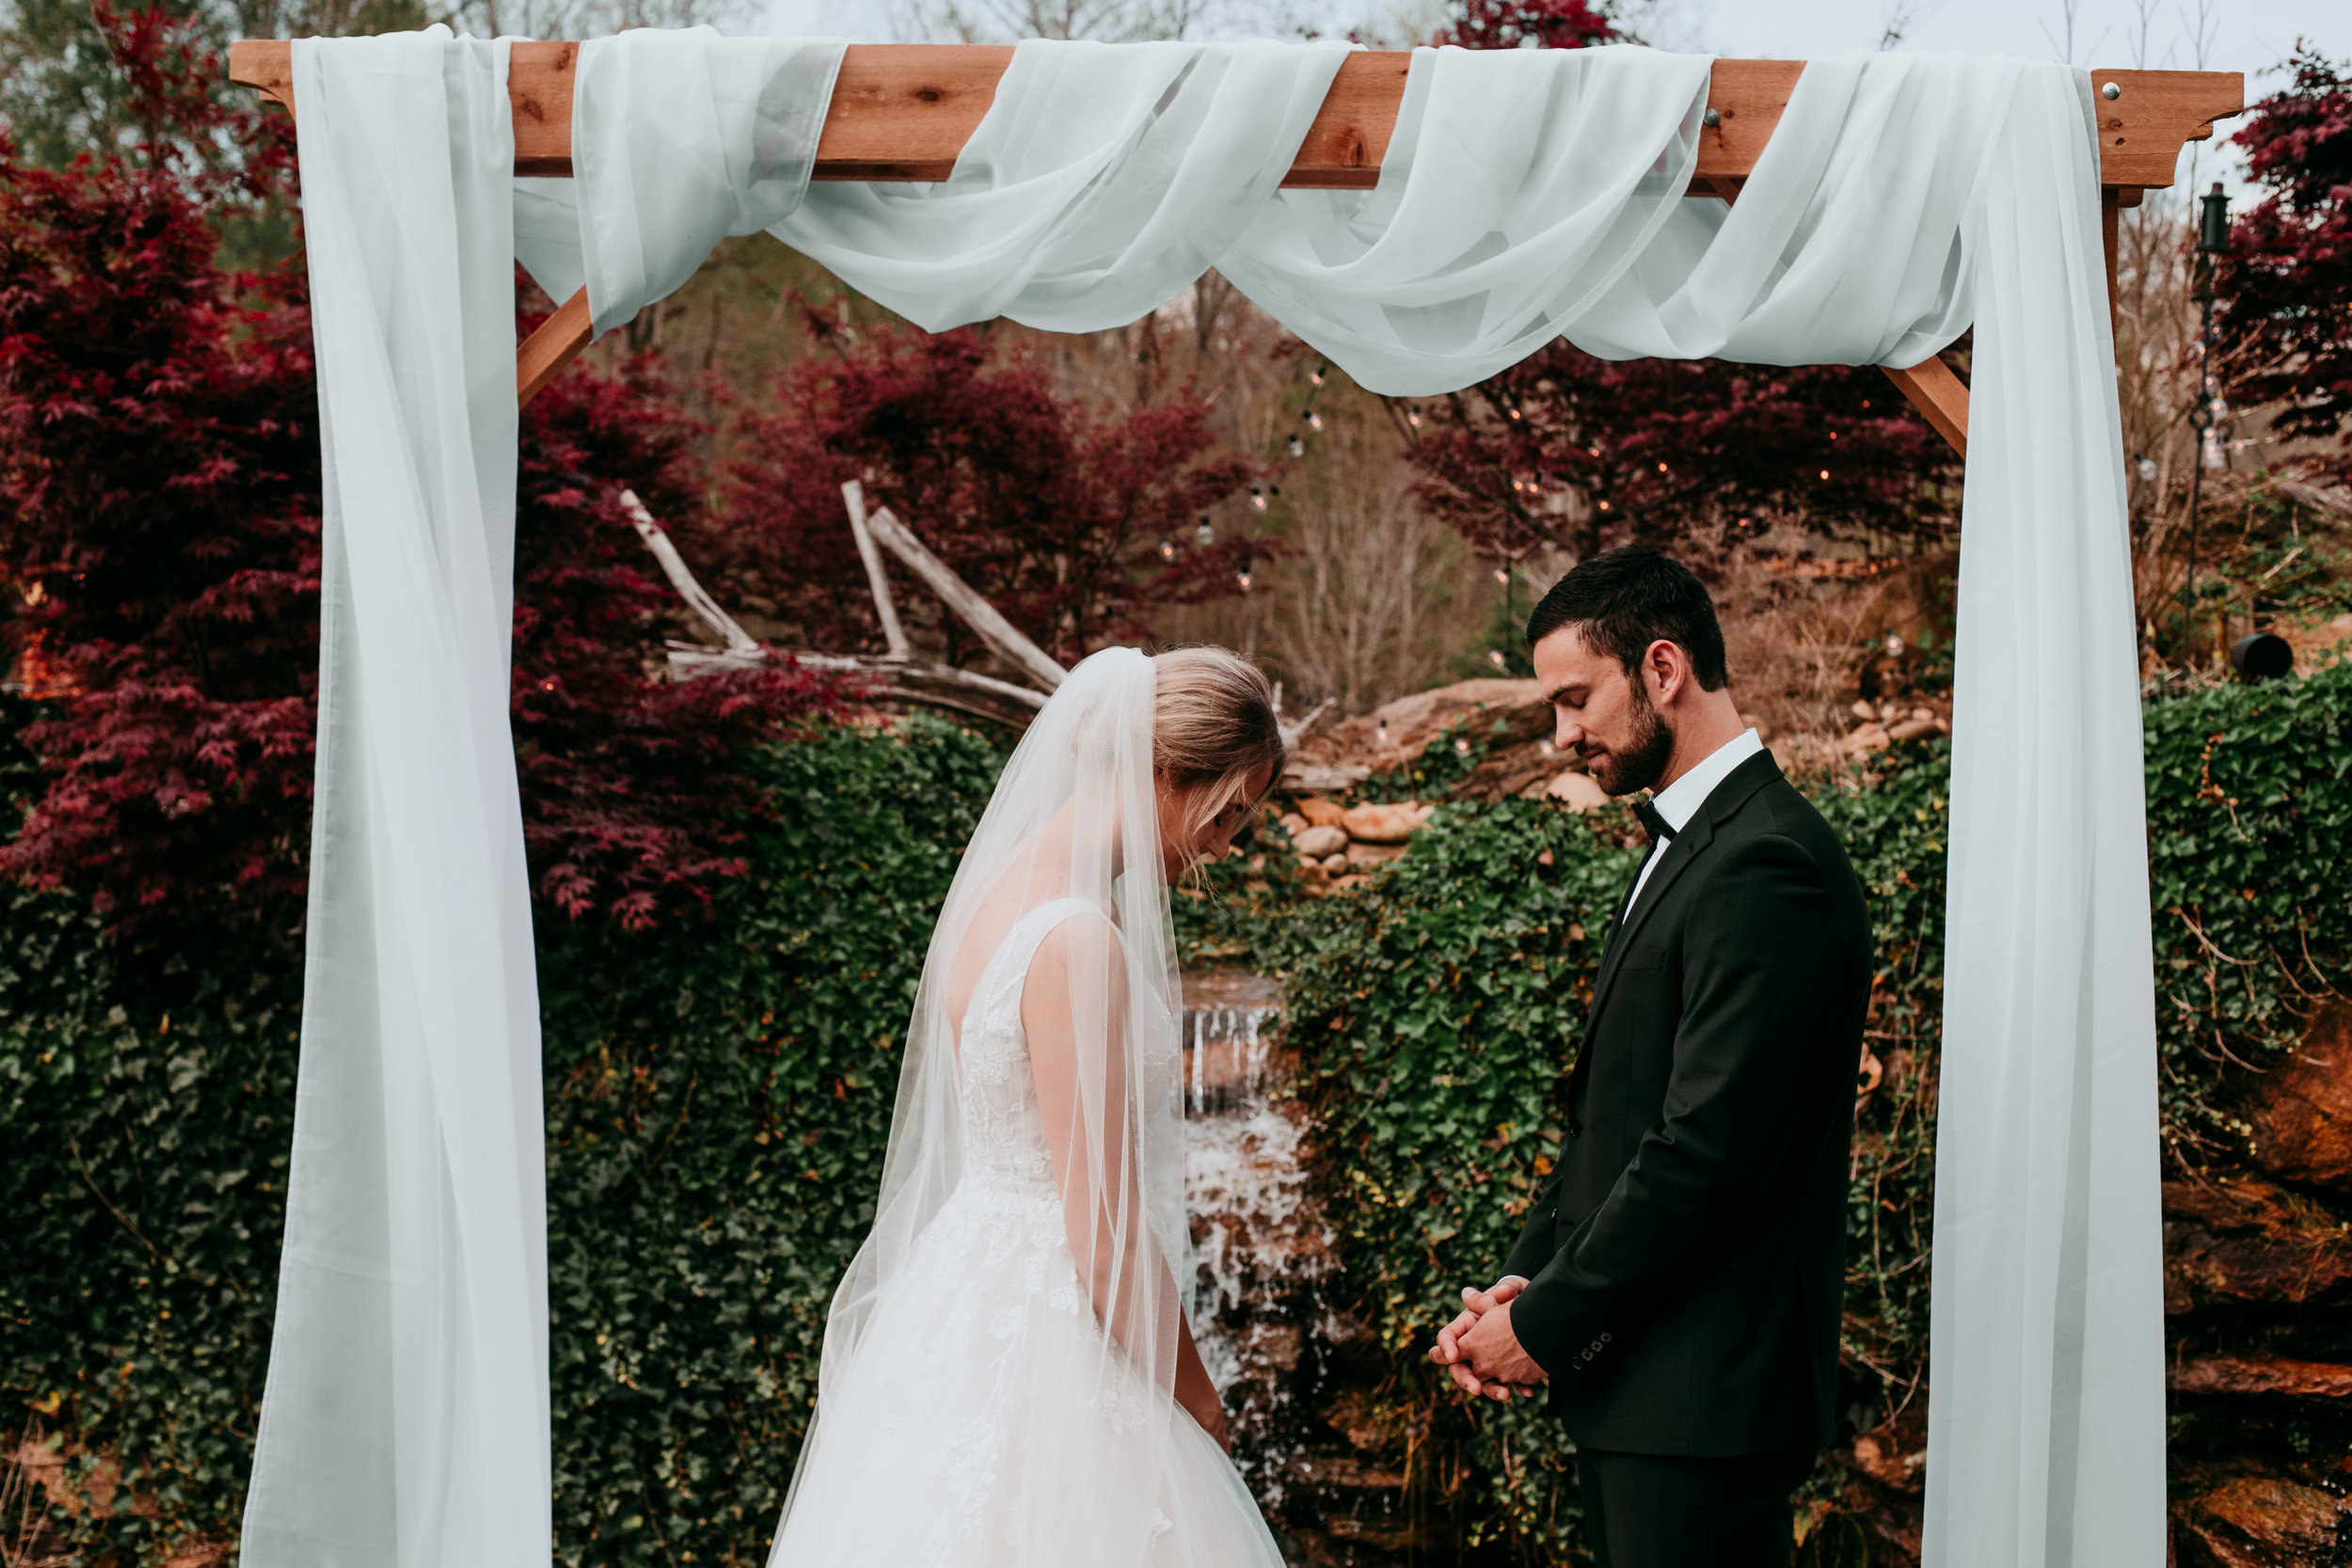 outdoor-wedding-ceremony-locations-near-me.jpg